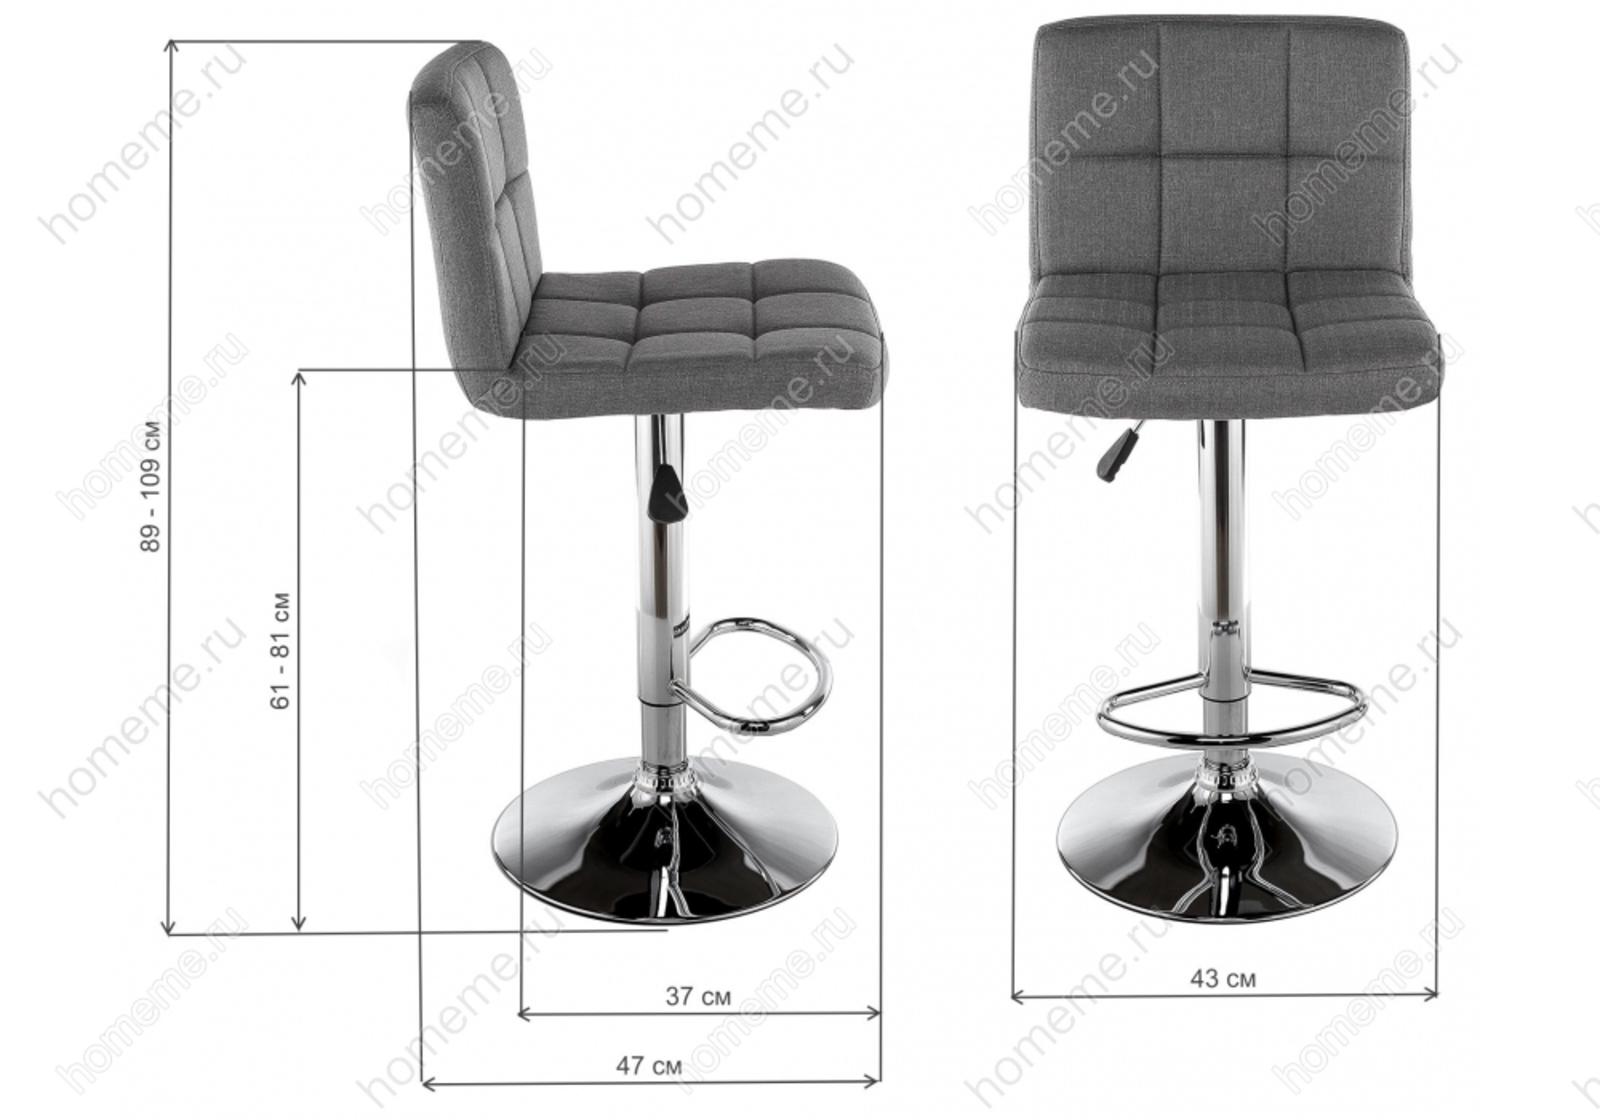 Барный стул Paskal grey fabric 1931 Paskal grey fabric 1931 (13901)